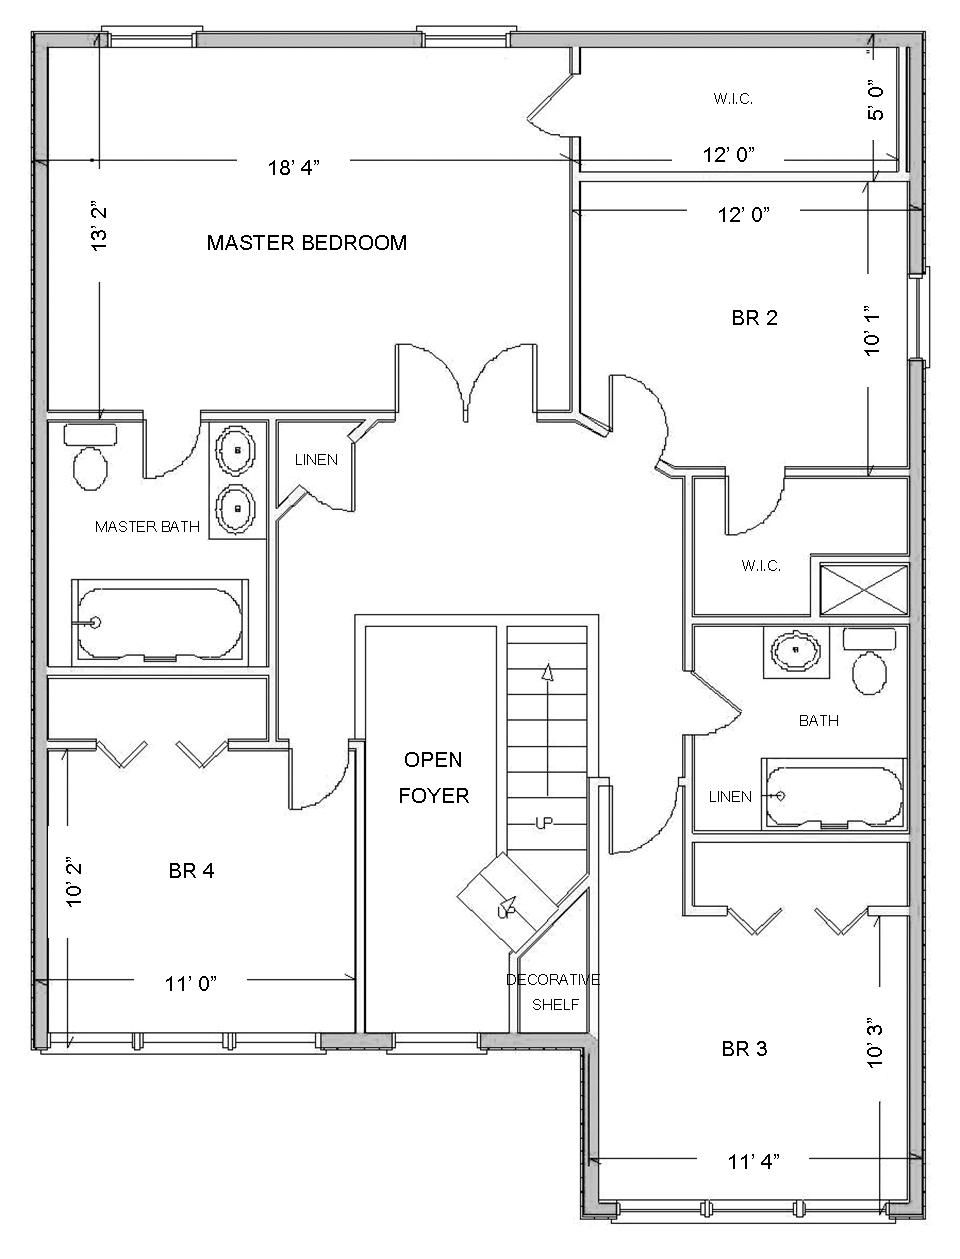 Digital Smart Draw Floor Plan With Smartdraw Software House